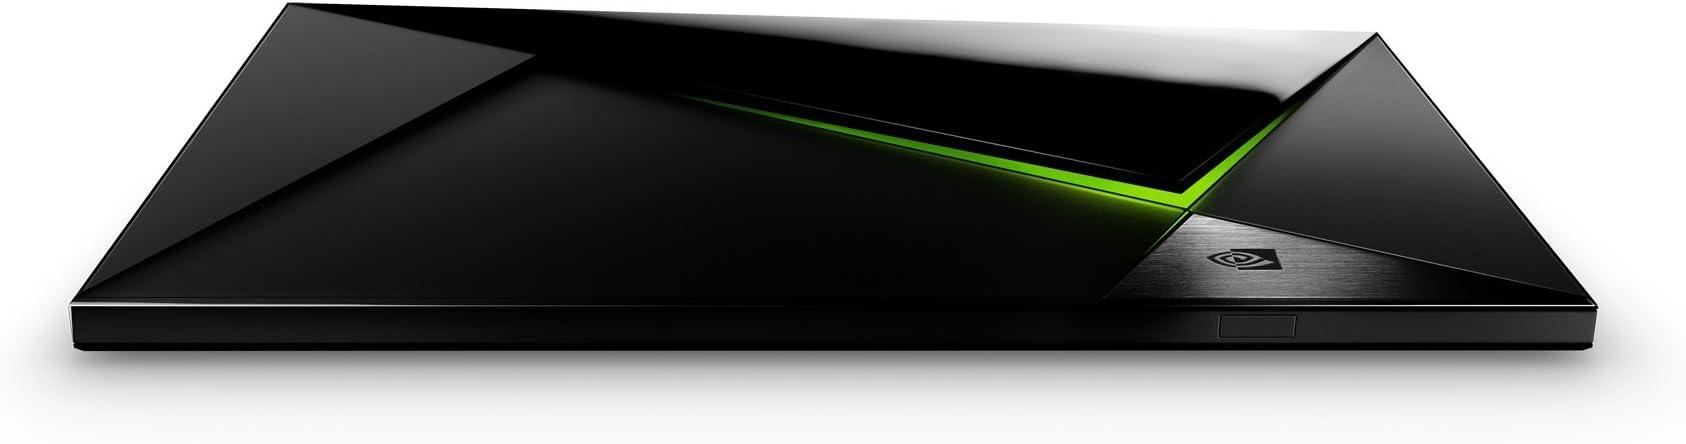 MINIX NEO U1,  Neo U9-H vs NVIDIA SHIELD TV Pro